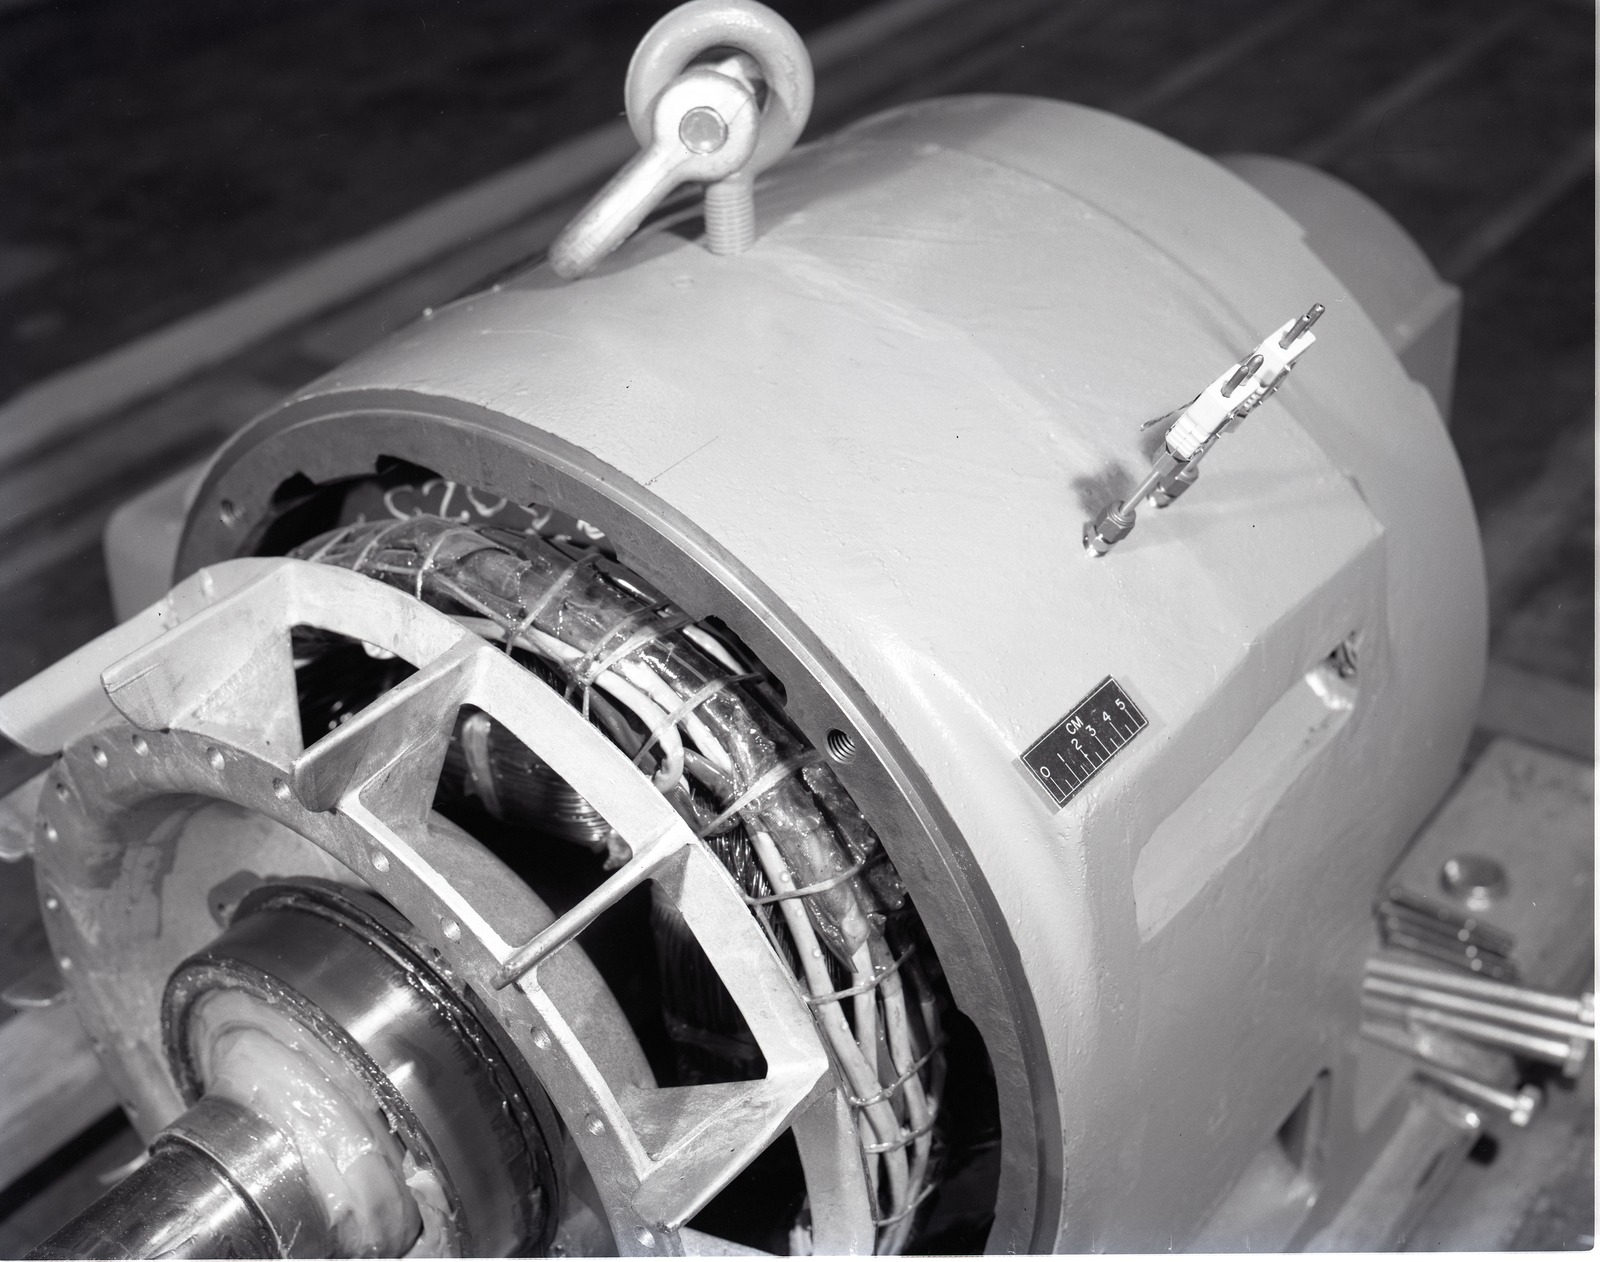 THERMOCOUPLES INSTALLED ON SHORT SHAFT GENERATOR FOR 100 KW KILOWATT WINDMILL